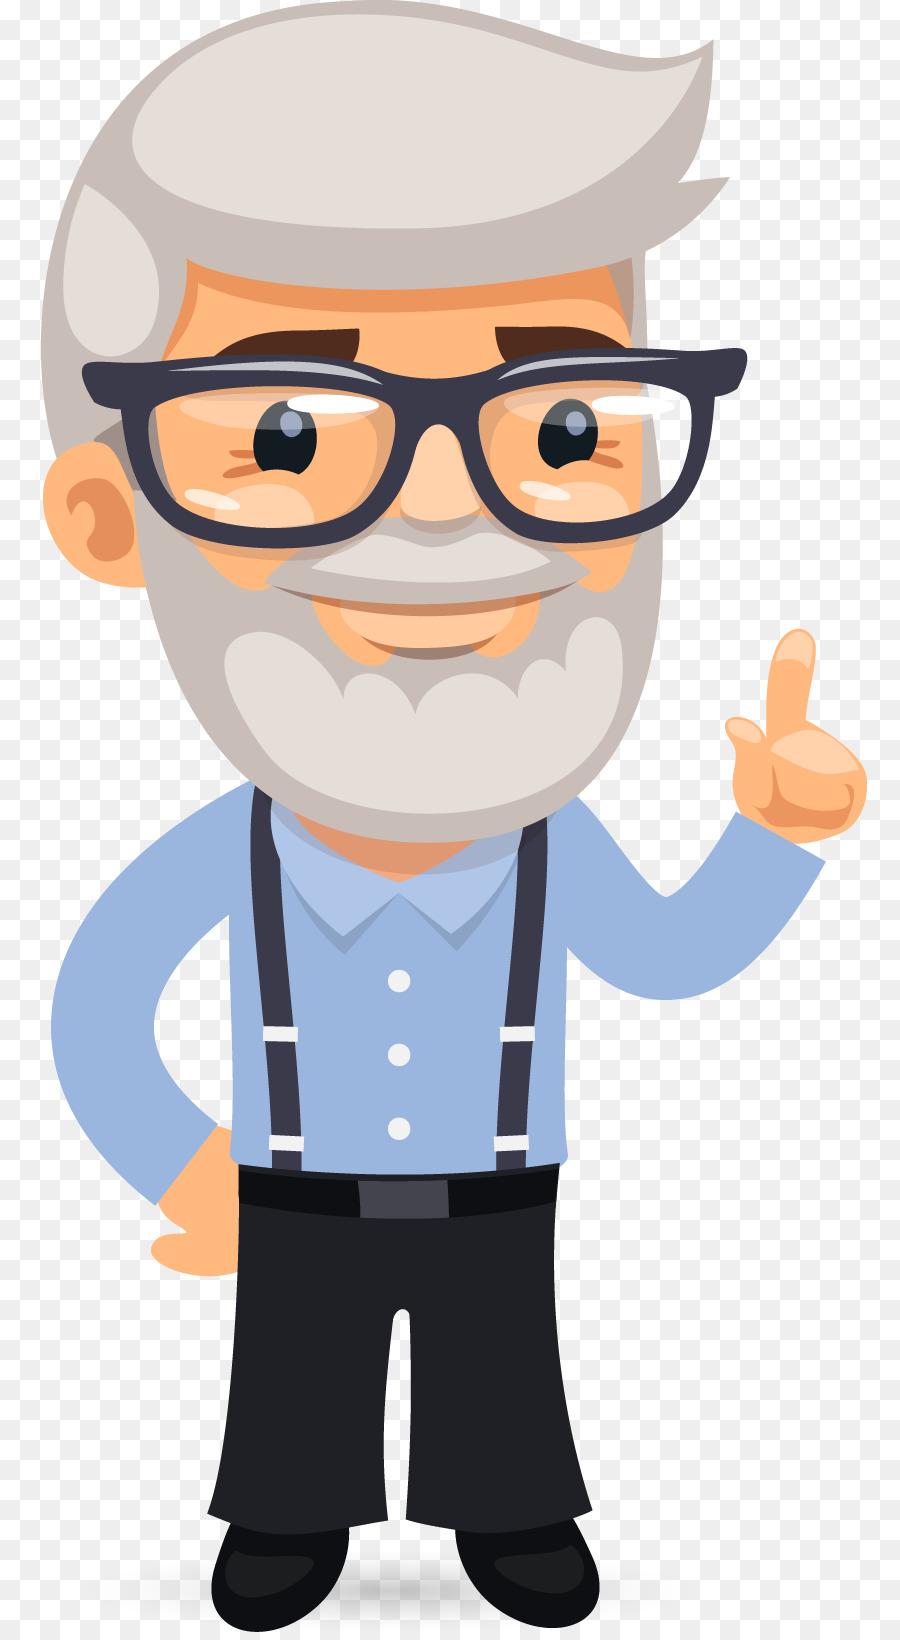 text icon cartoon senior mathematics professor picture